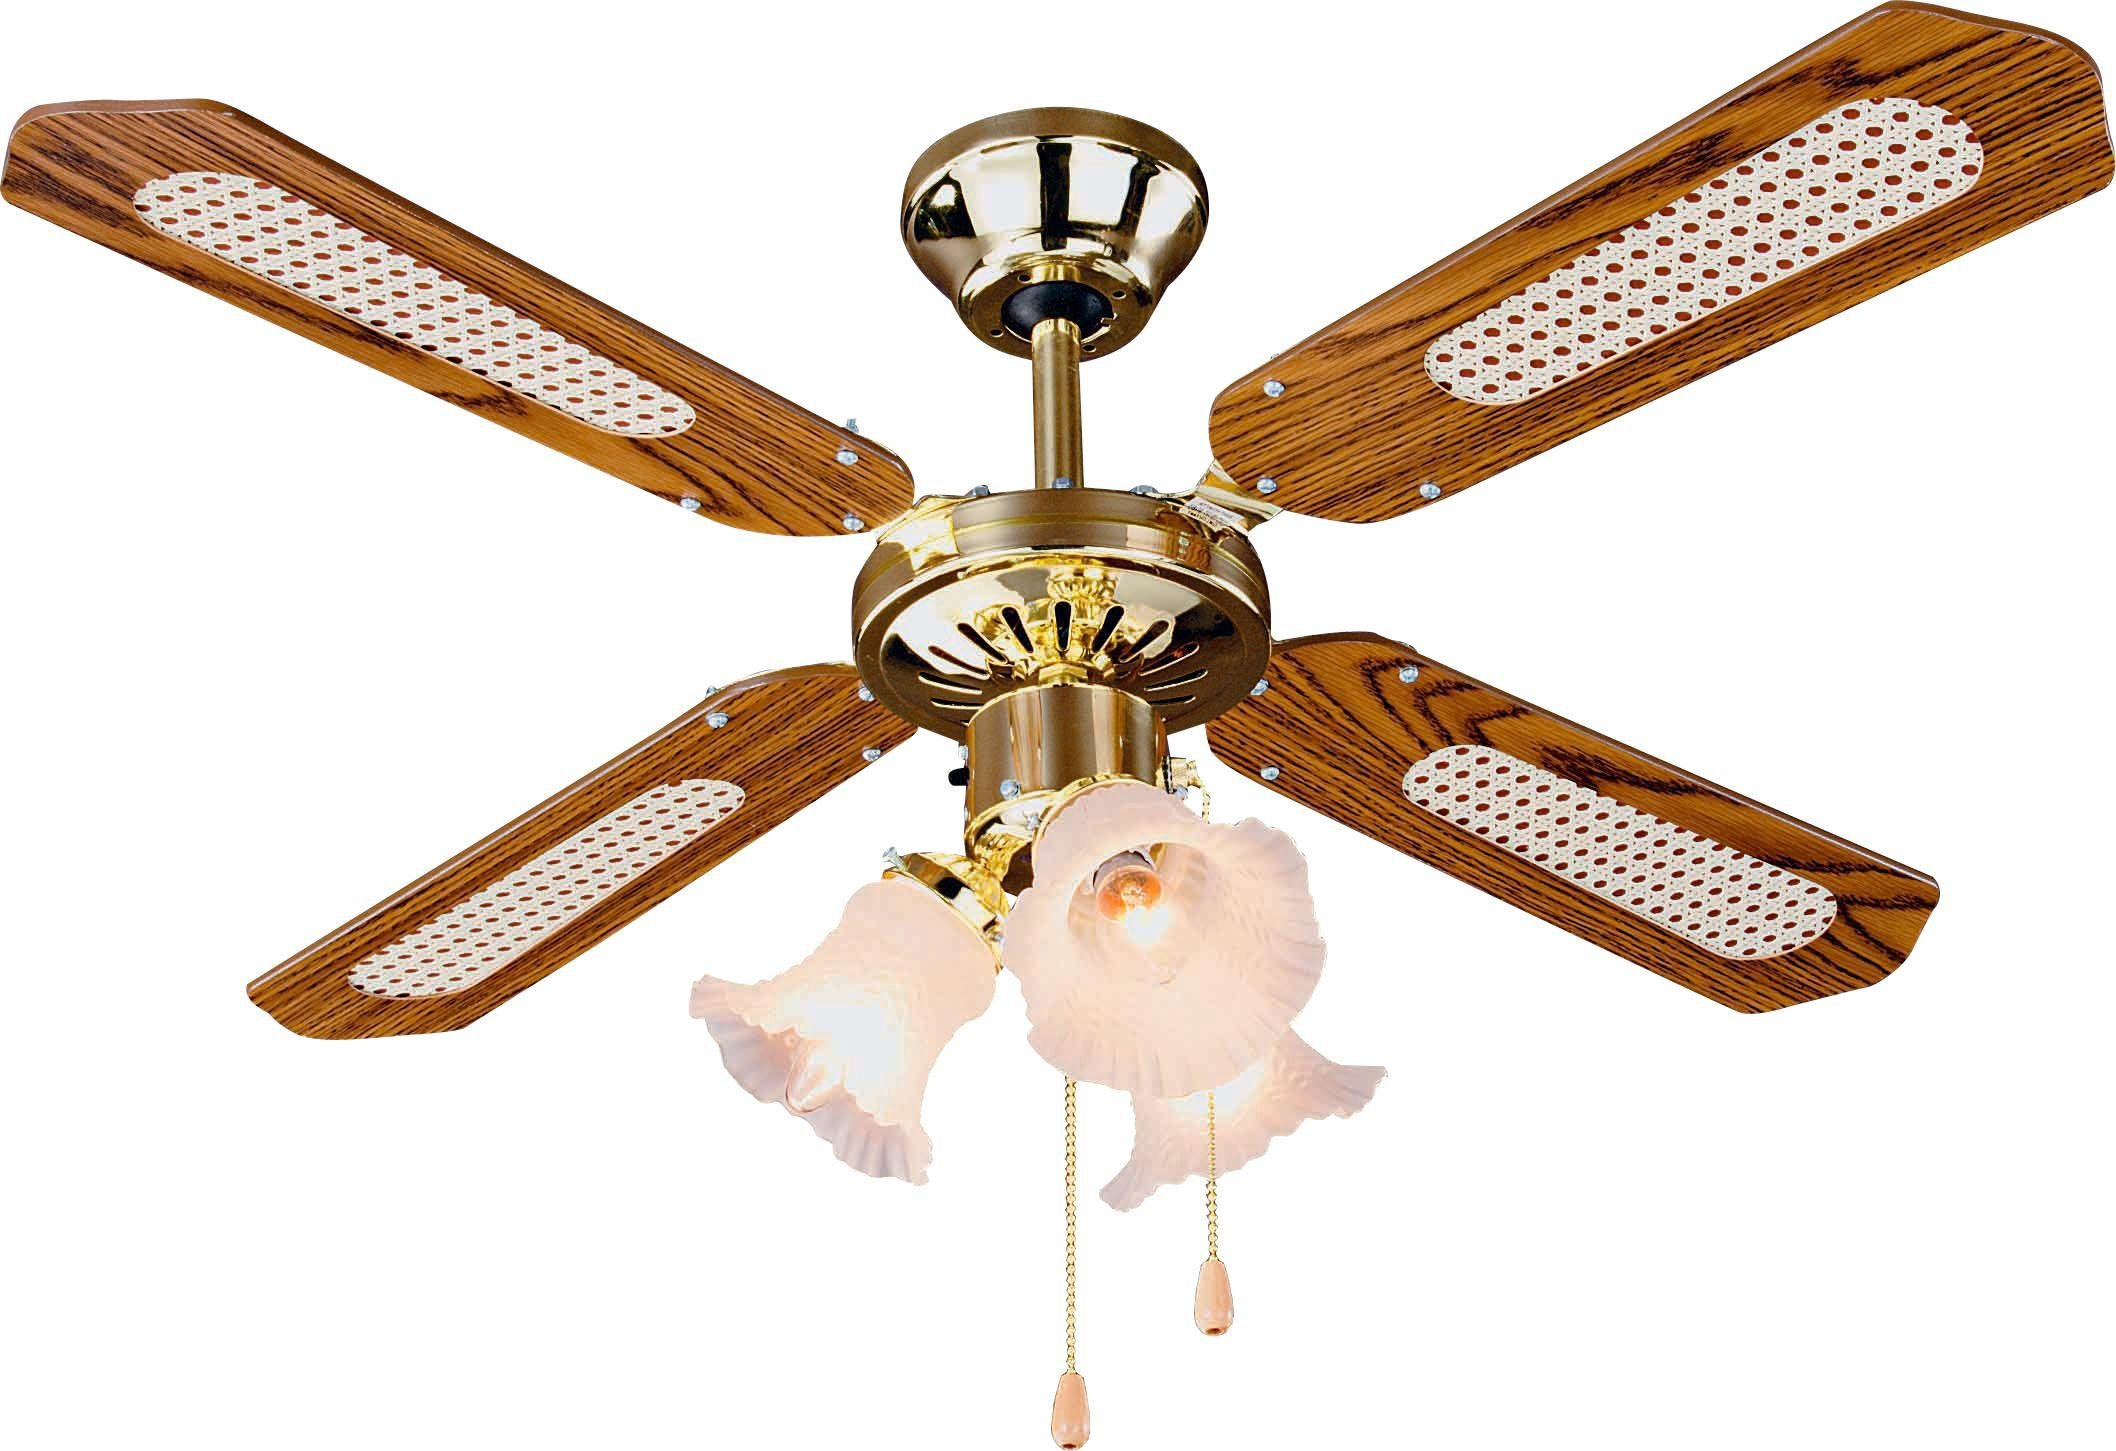 Argos Home Decorative 3 Light Ceiling Fan - Brass